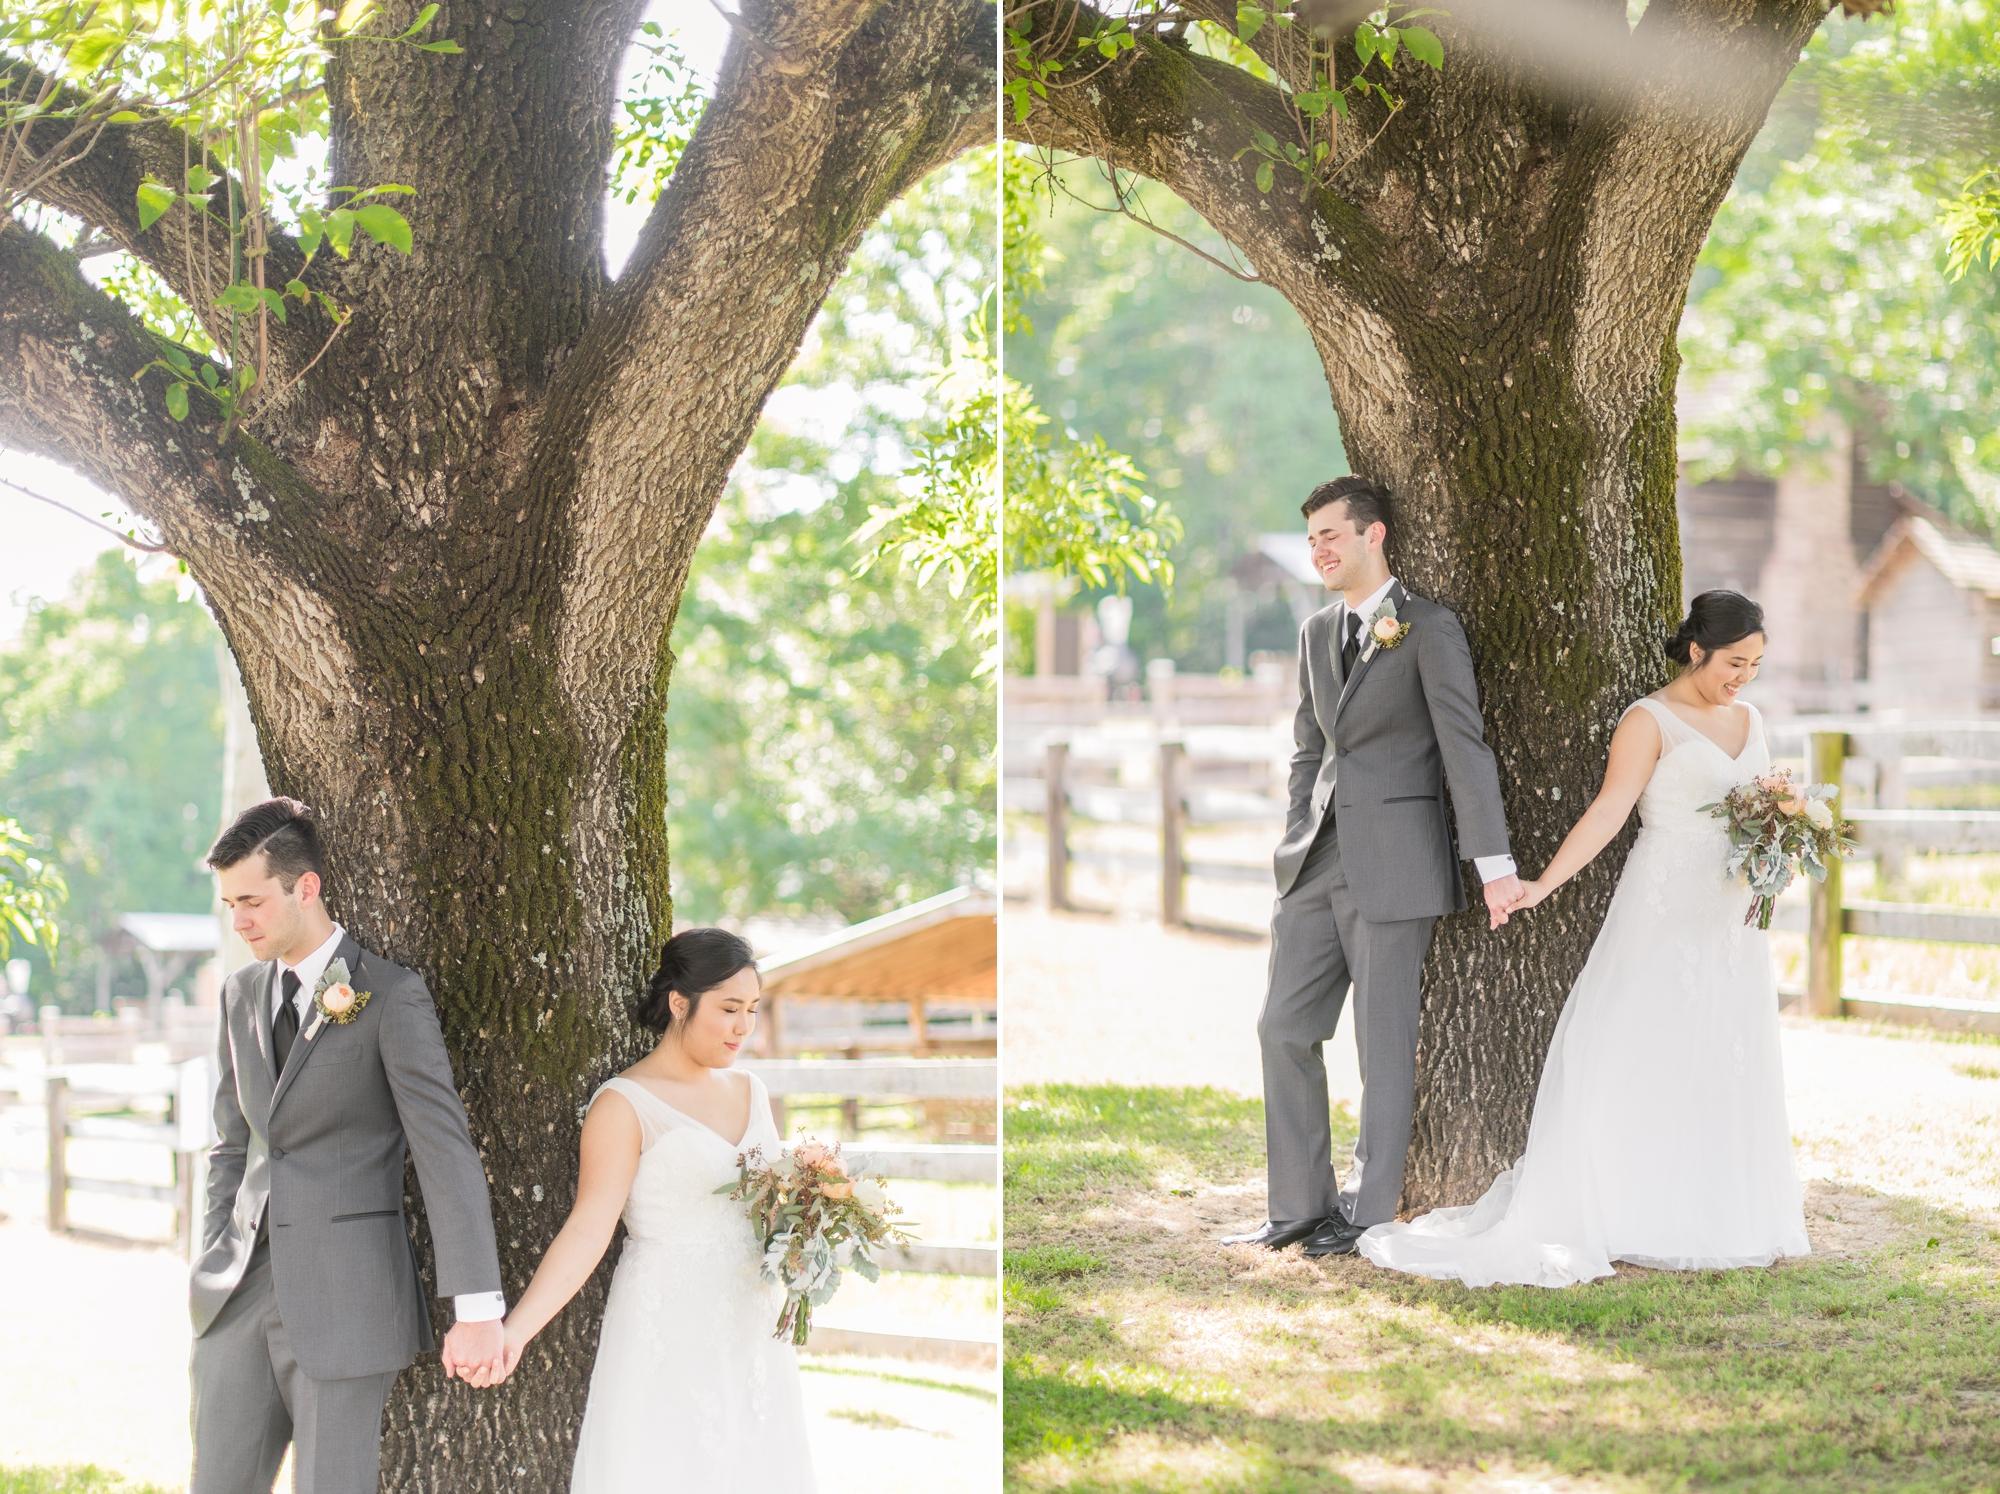 giles wedding blog 18.jpg